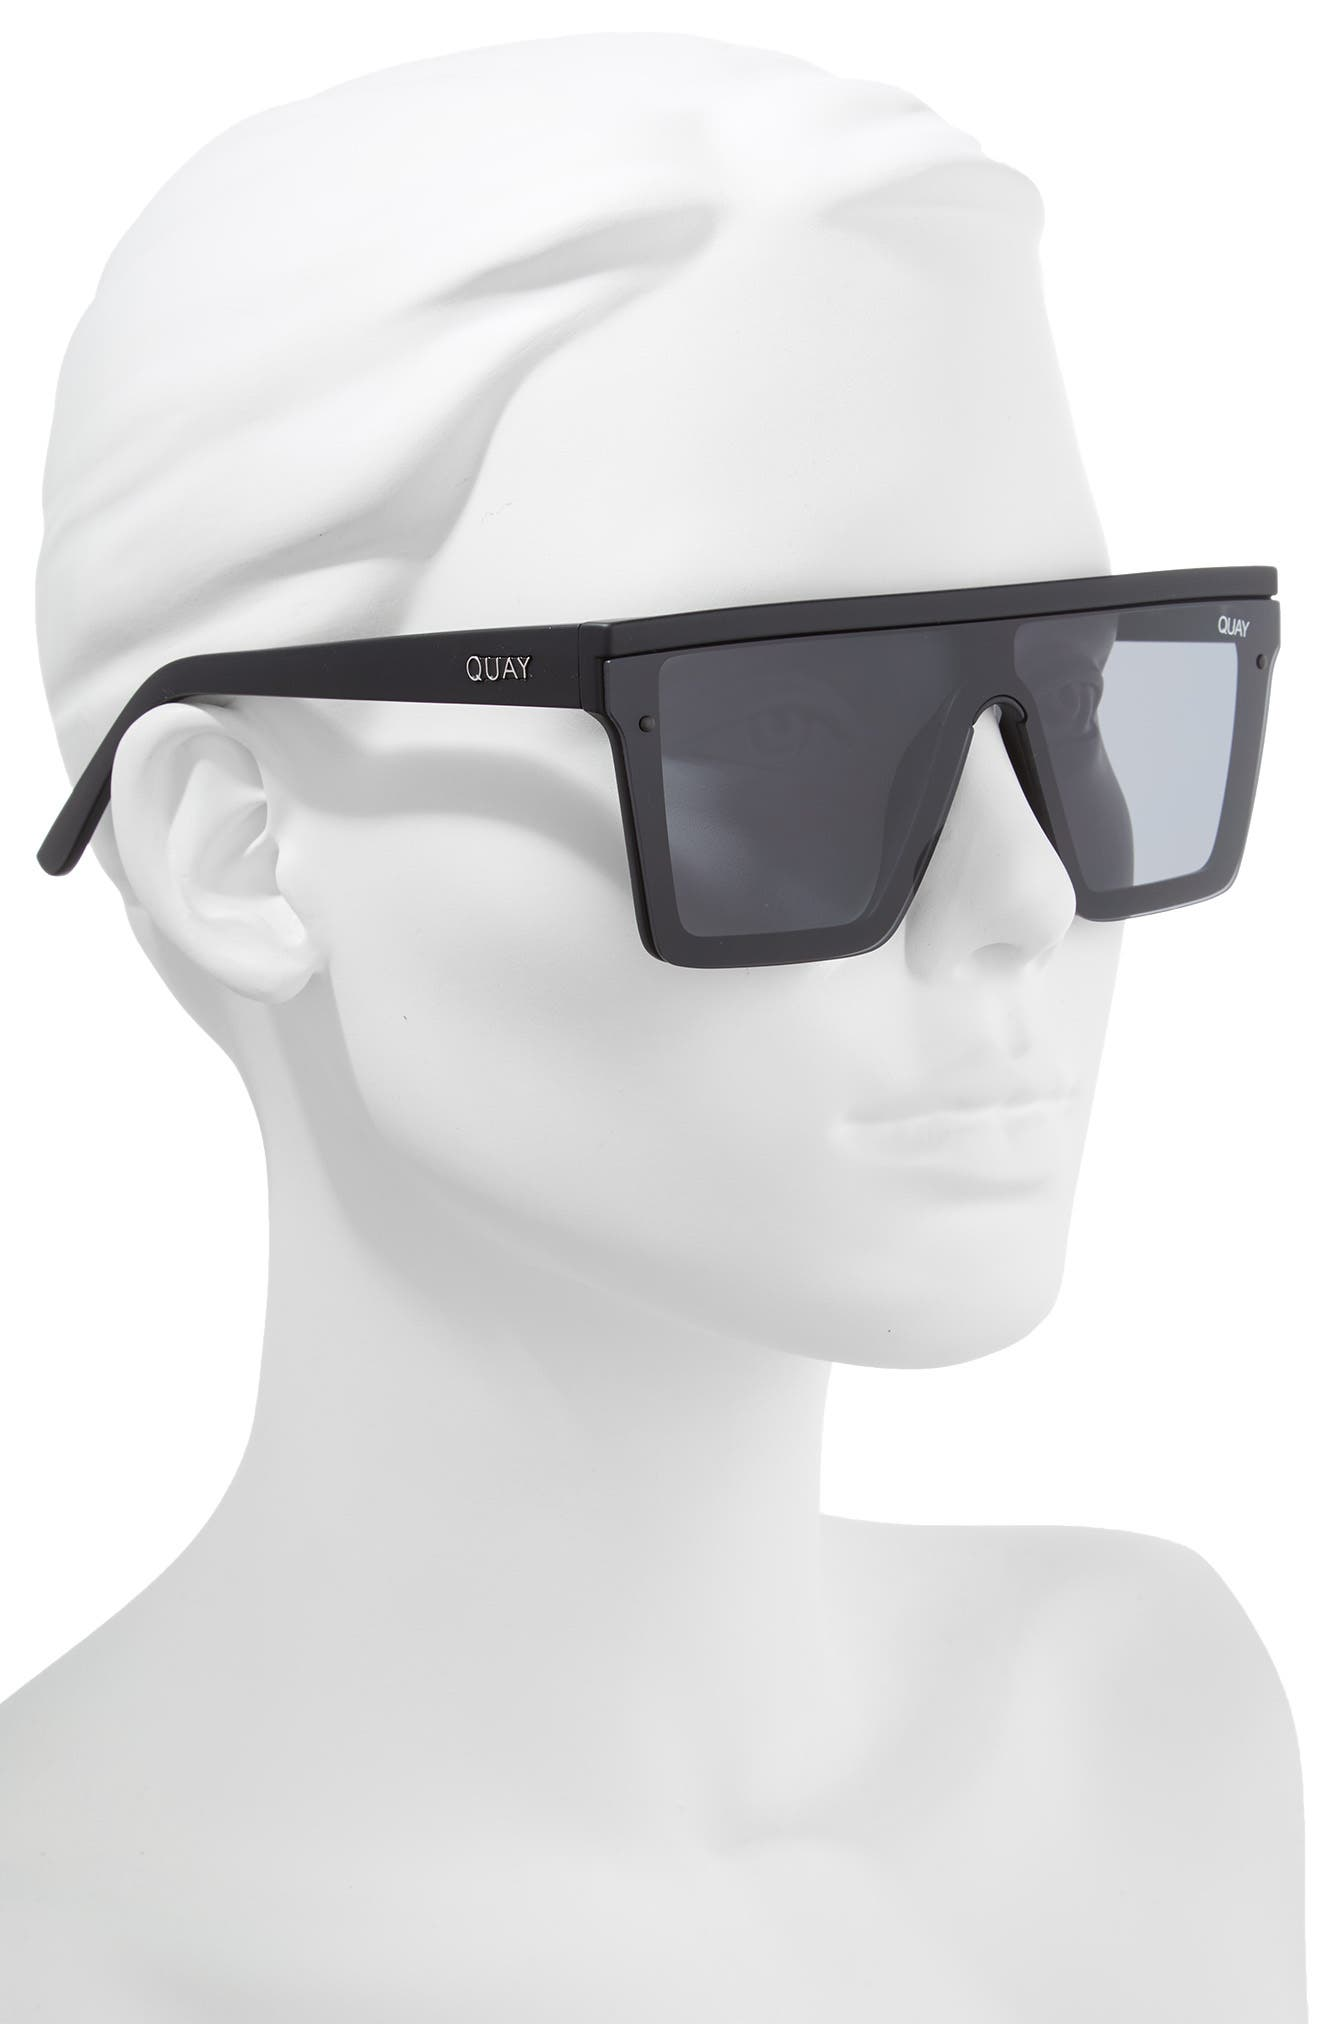 Hindsight 67mm Shield Sunglasses,                             Alternate thumbnail 3, color,                             Black/ Smoke